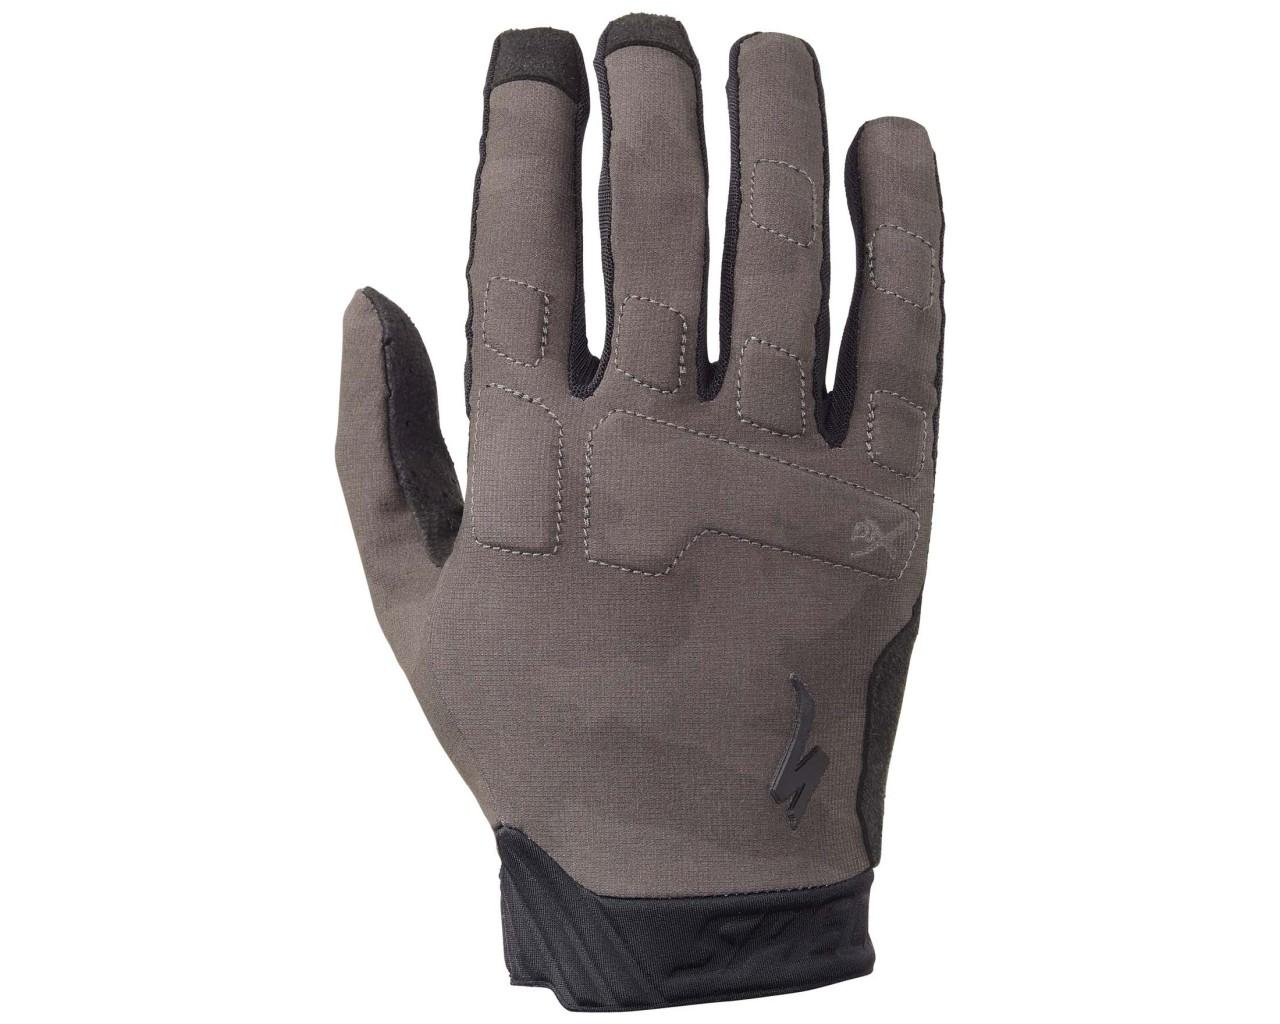 Specialized Ridge Handschuhe langfinger | black camo